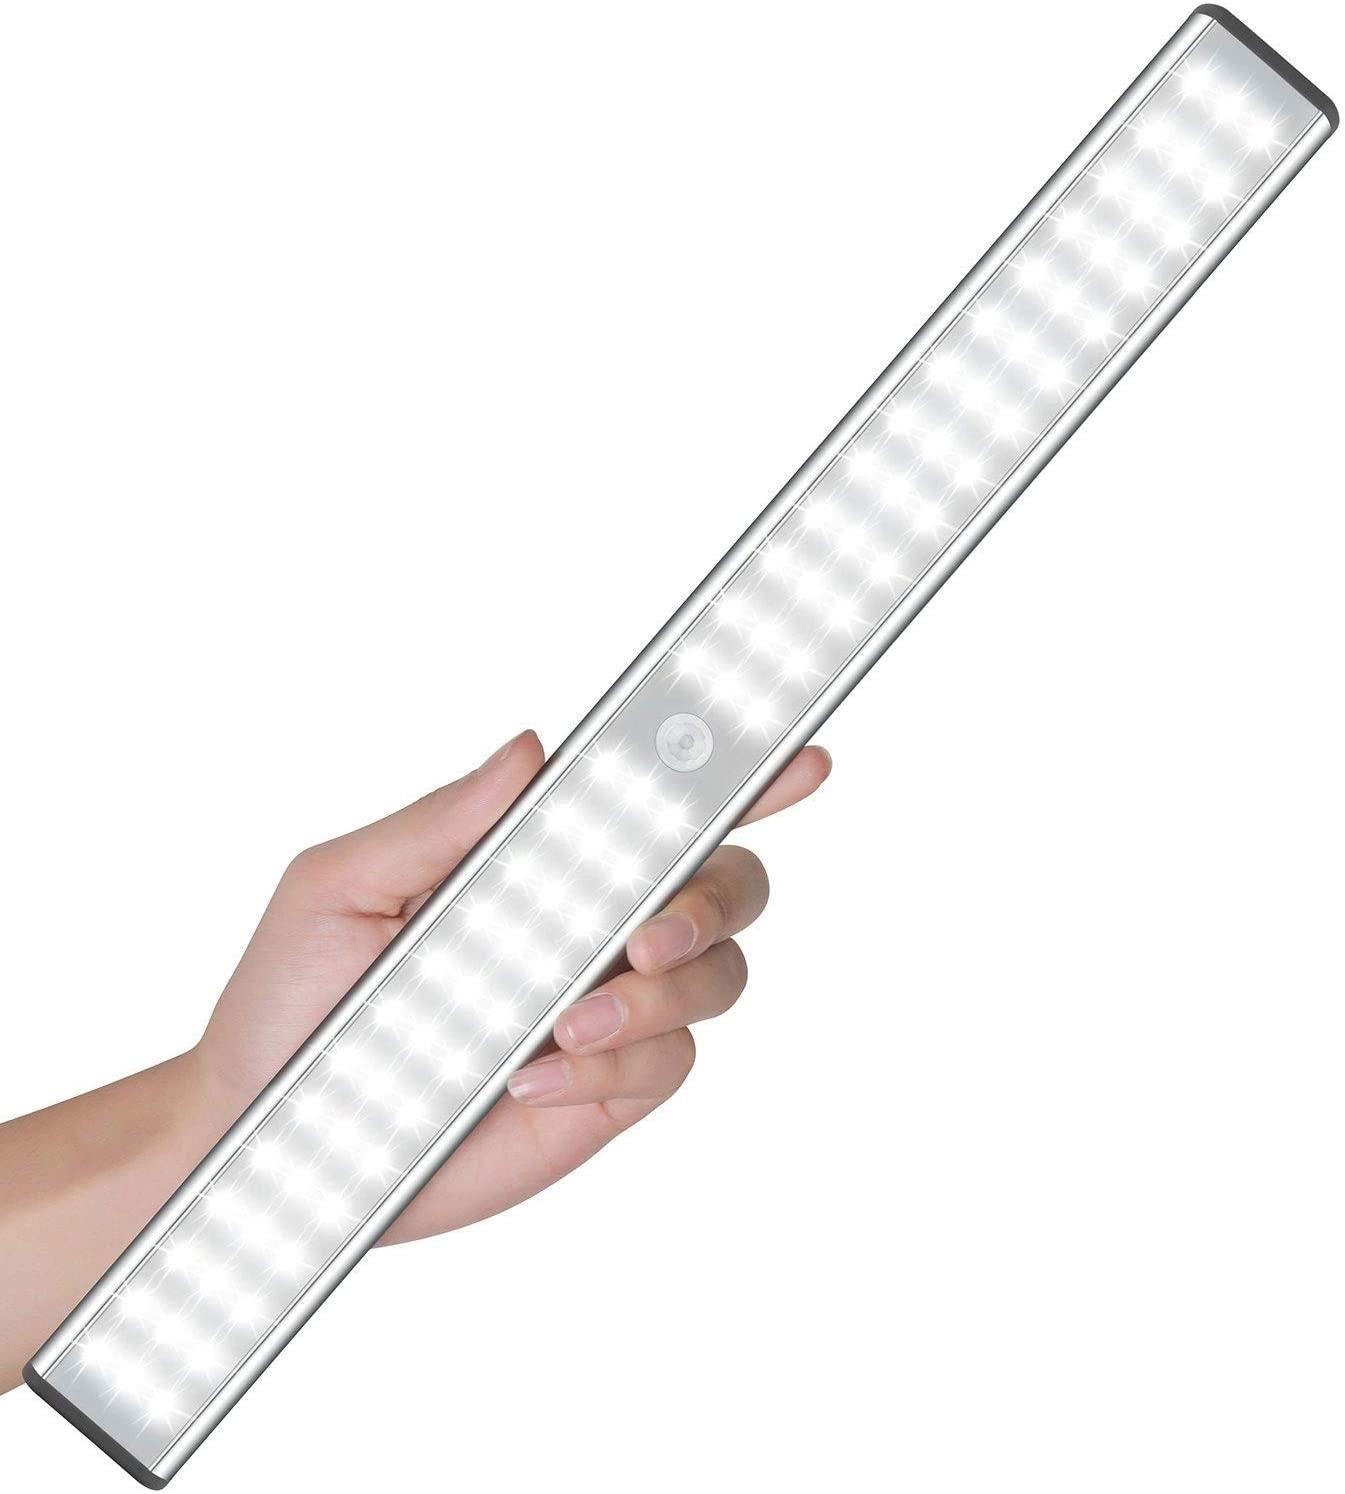 MOSTON Super Bright Rechargeable Closet Light 78LED - $19.75 AC